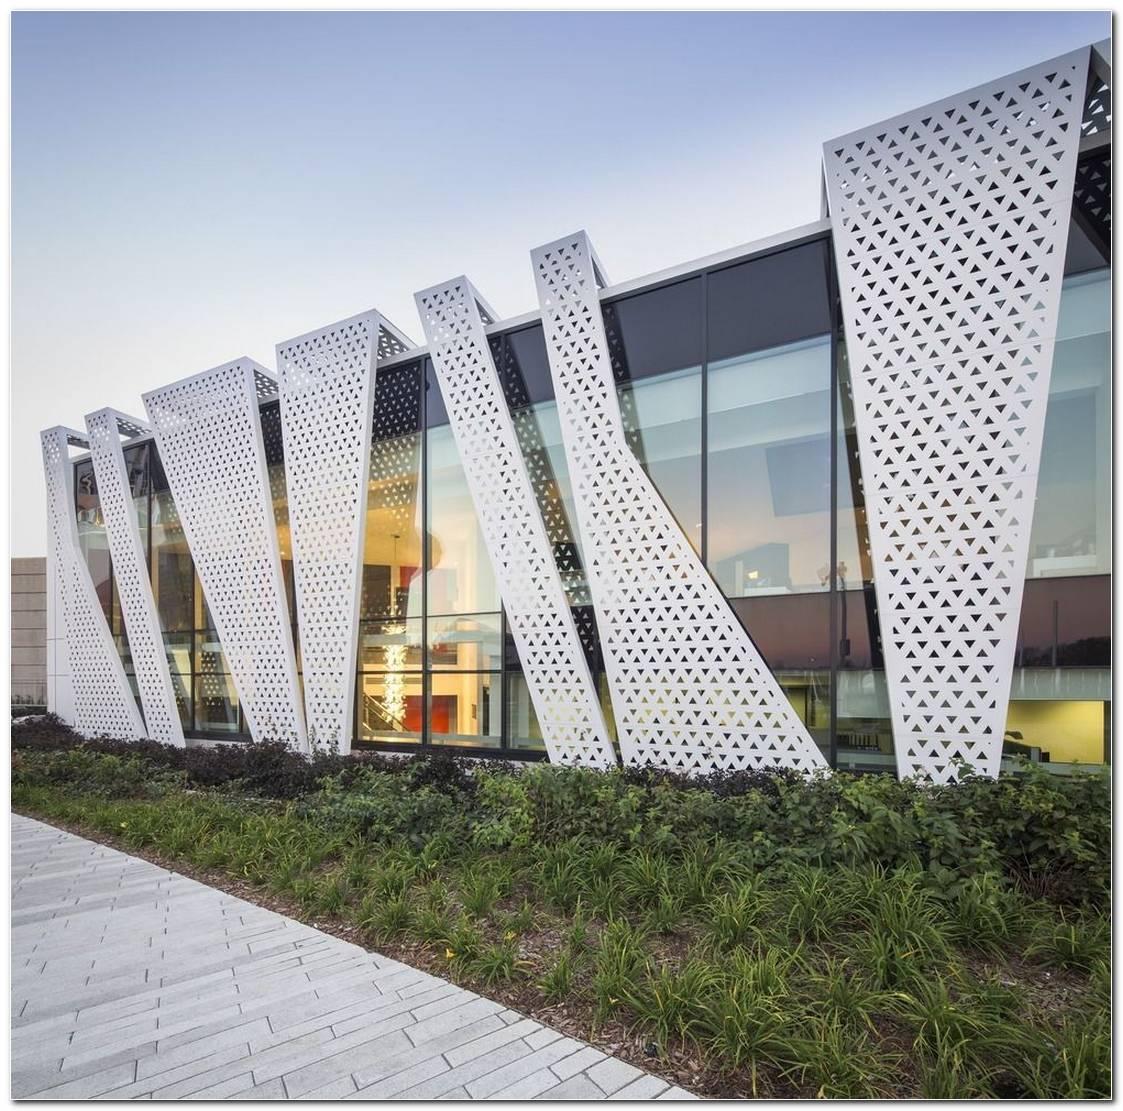 Fachadas Metálicas 30 Projetos Diferenciados E Modernos